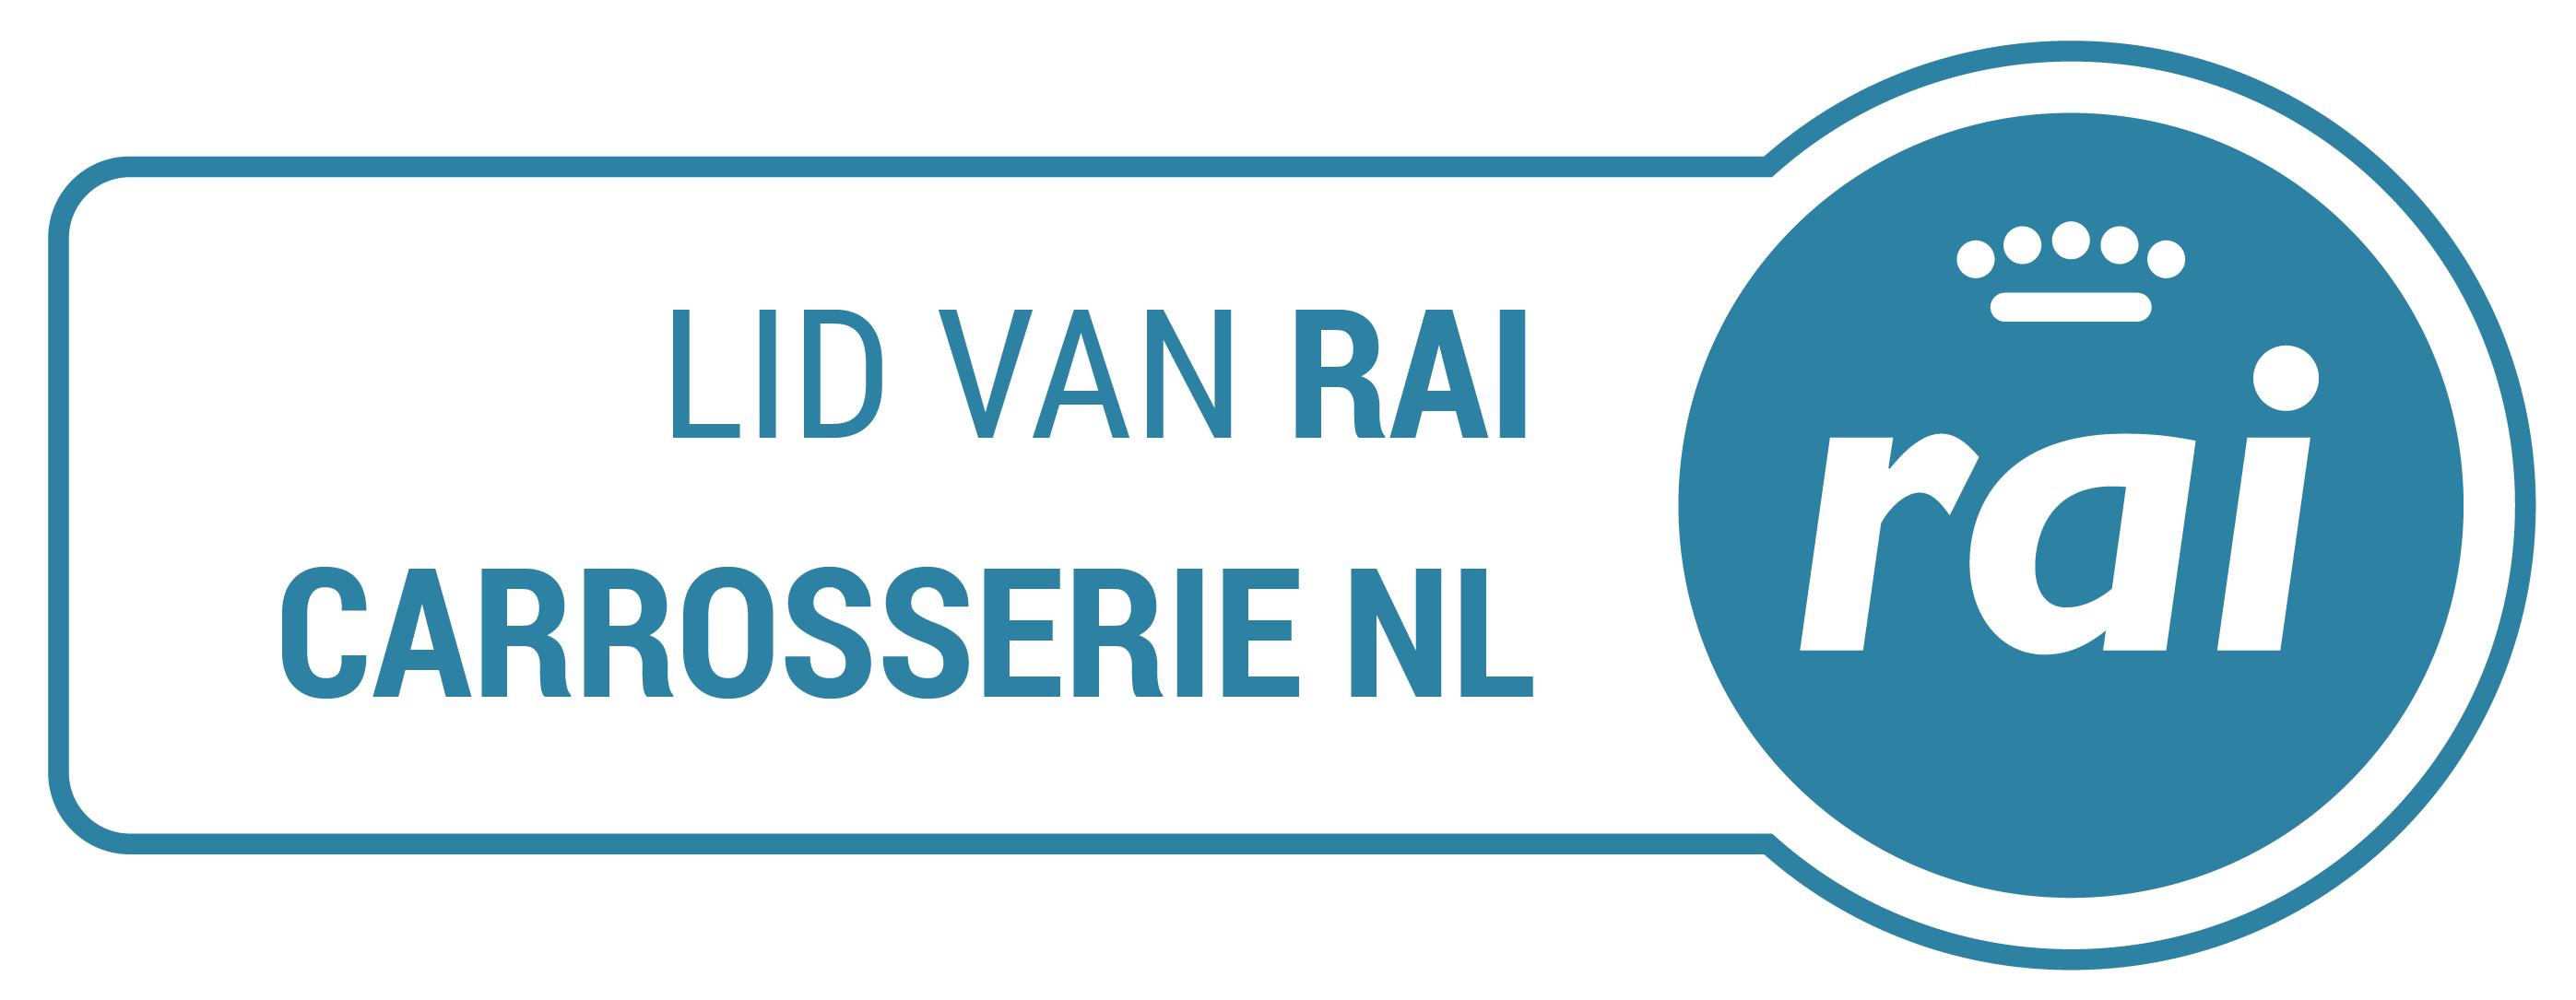 Lid van RAI Carrosserie NL